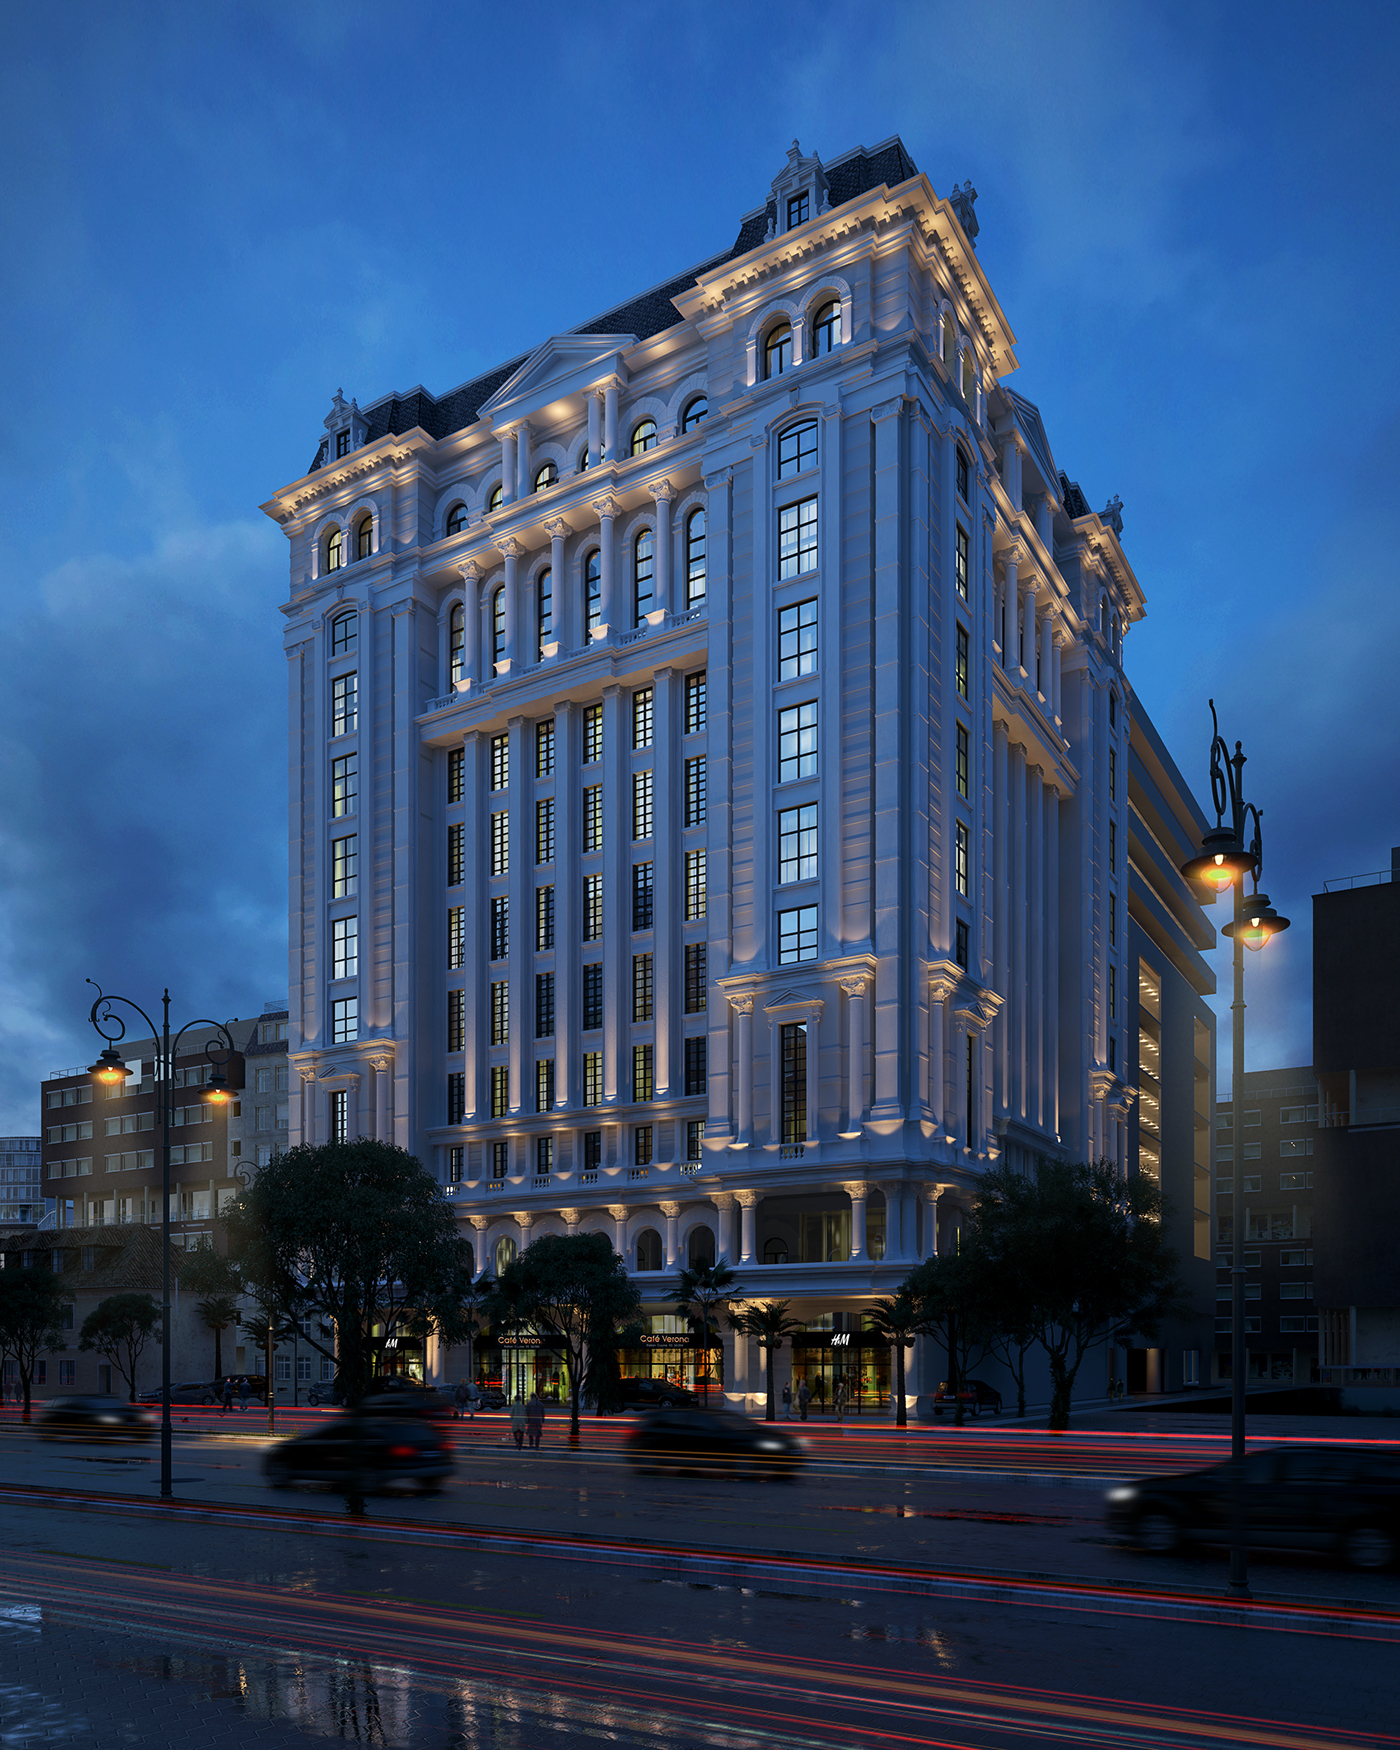 5 Stars Hotel In Jeddah On Behance